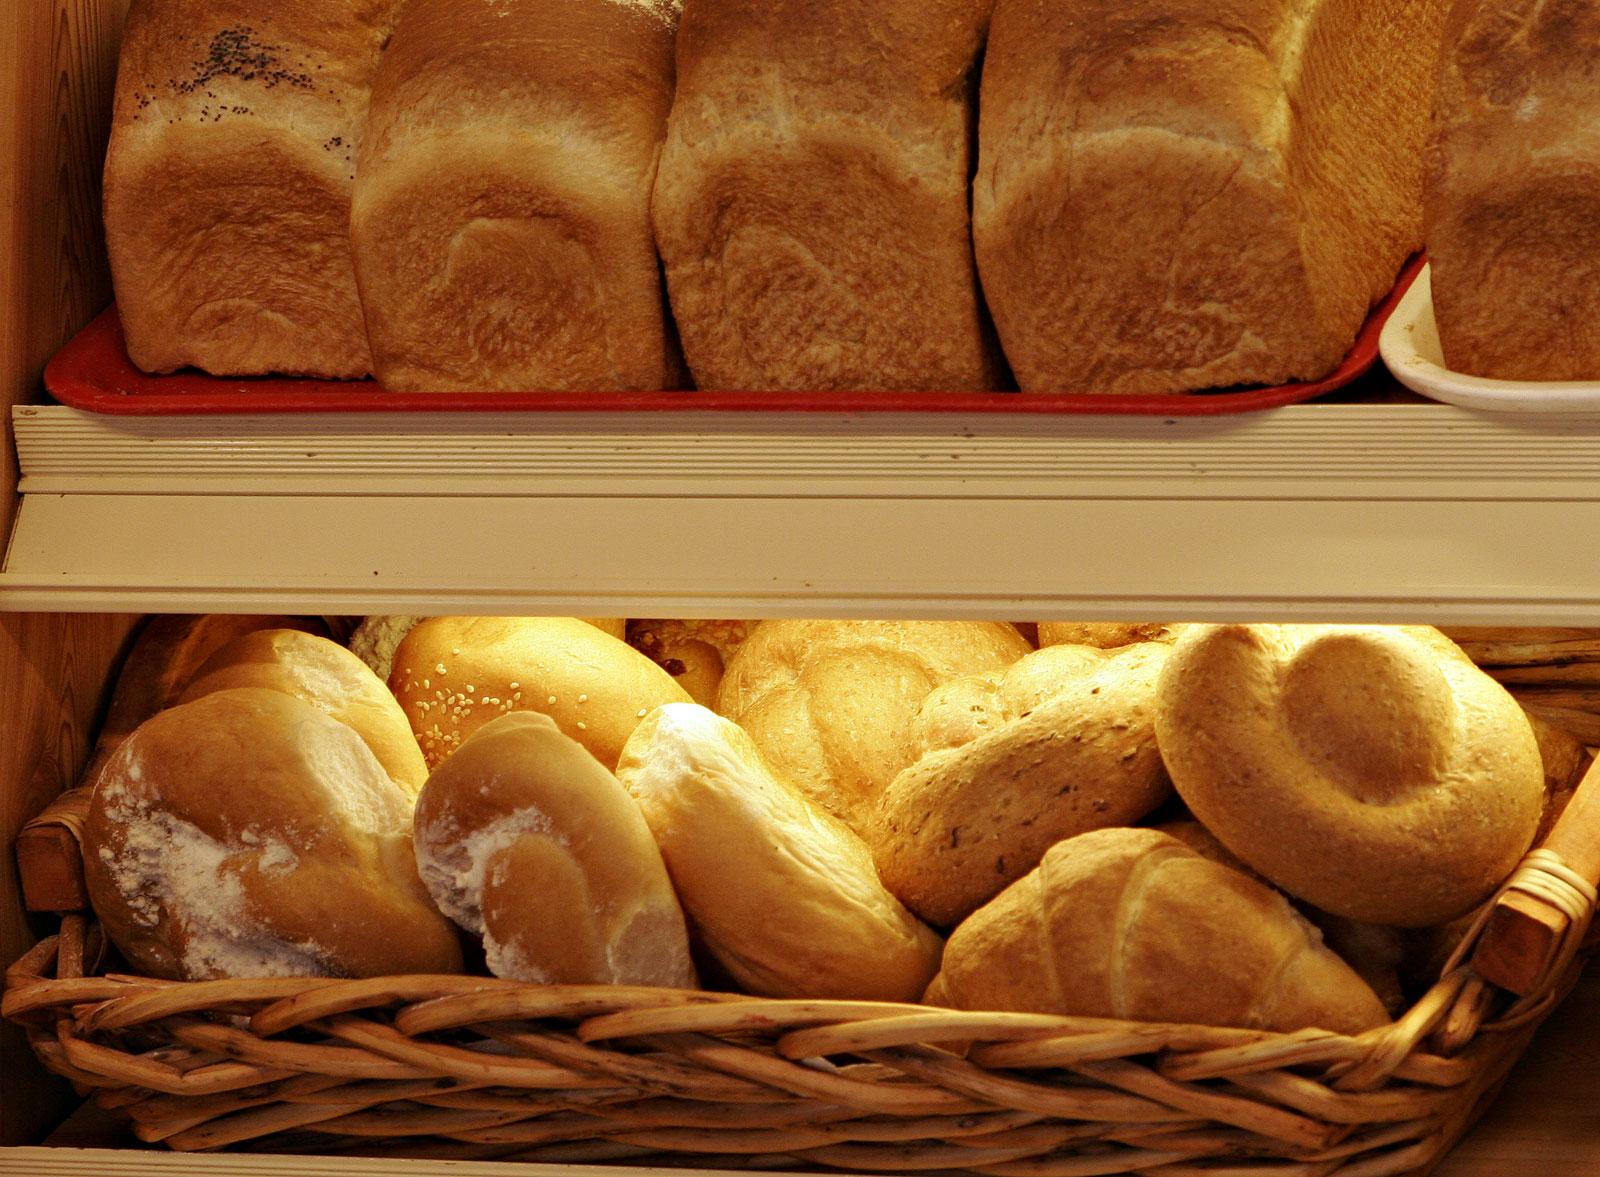 http://moslenta.files.wordpress.com/2010/08/breads_and_rolls.jpg